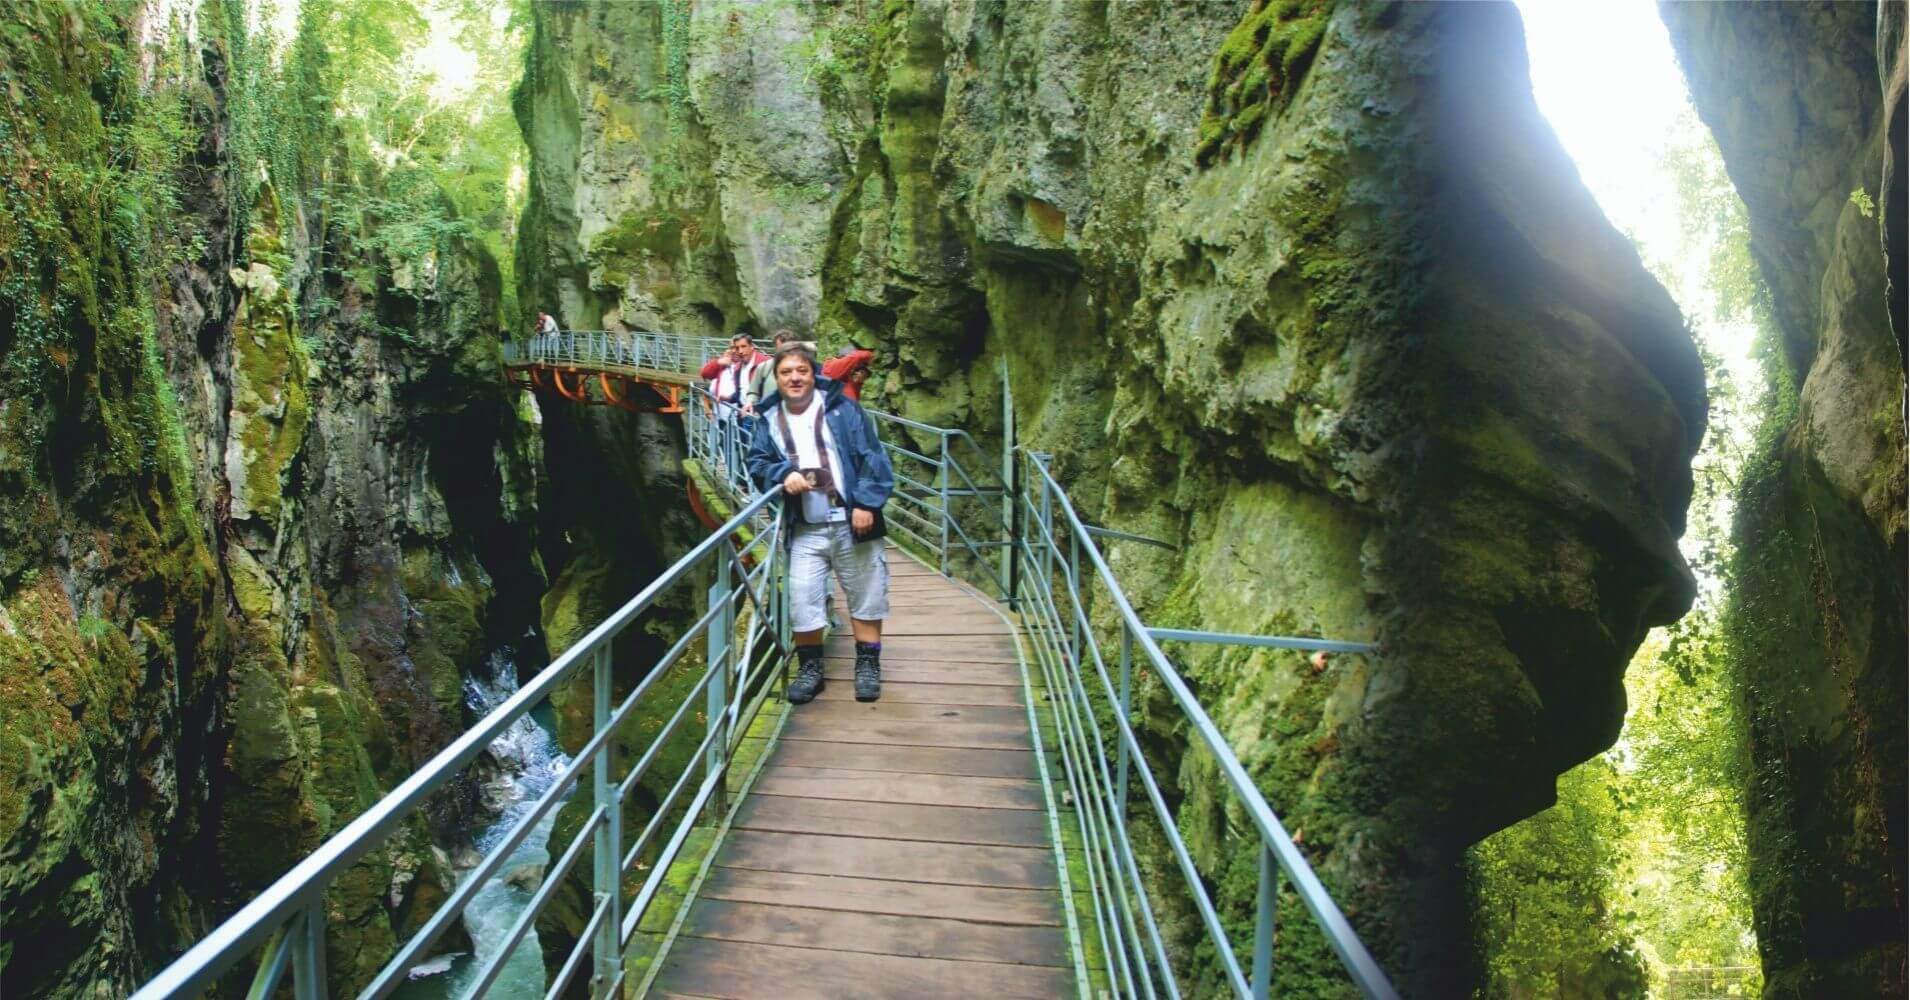 Pasarela Gorges du Fier. Lovagni, Alta Saboya. Auvernia-Ródano-Alpes. Francia.